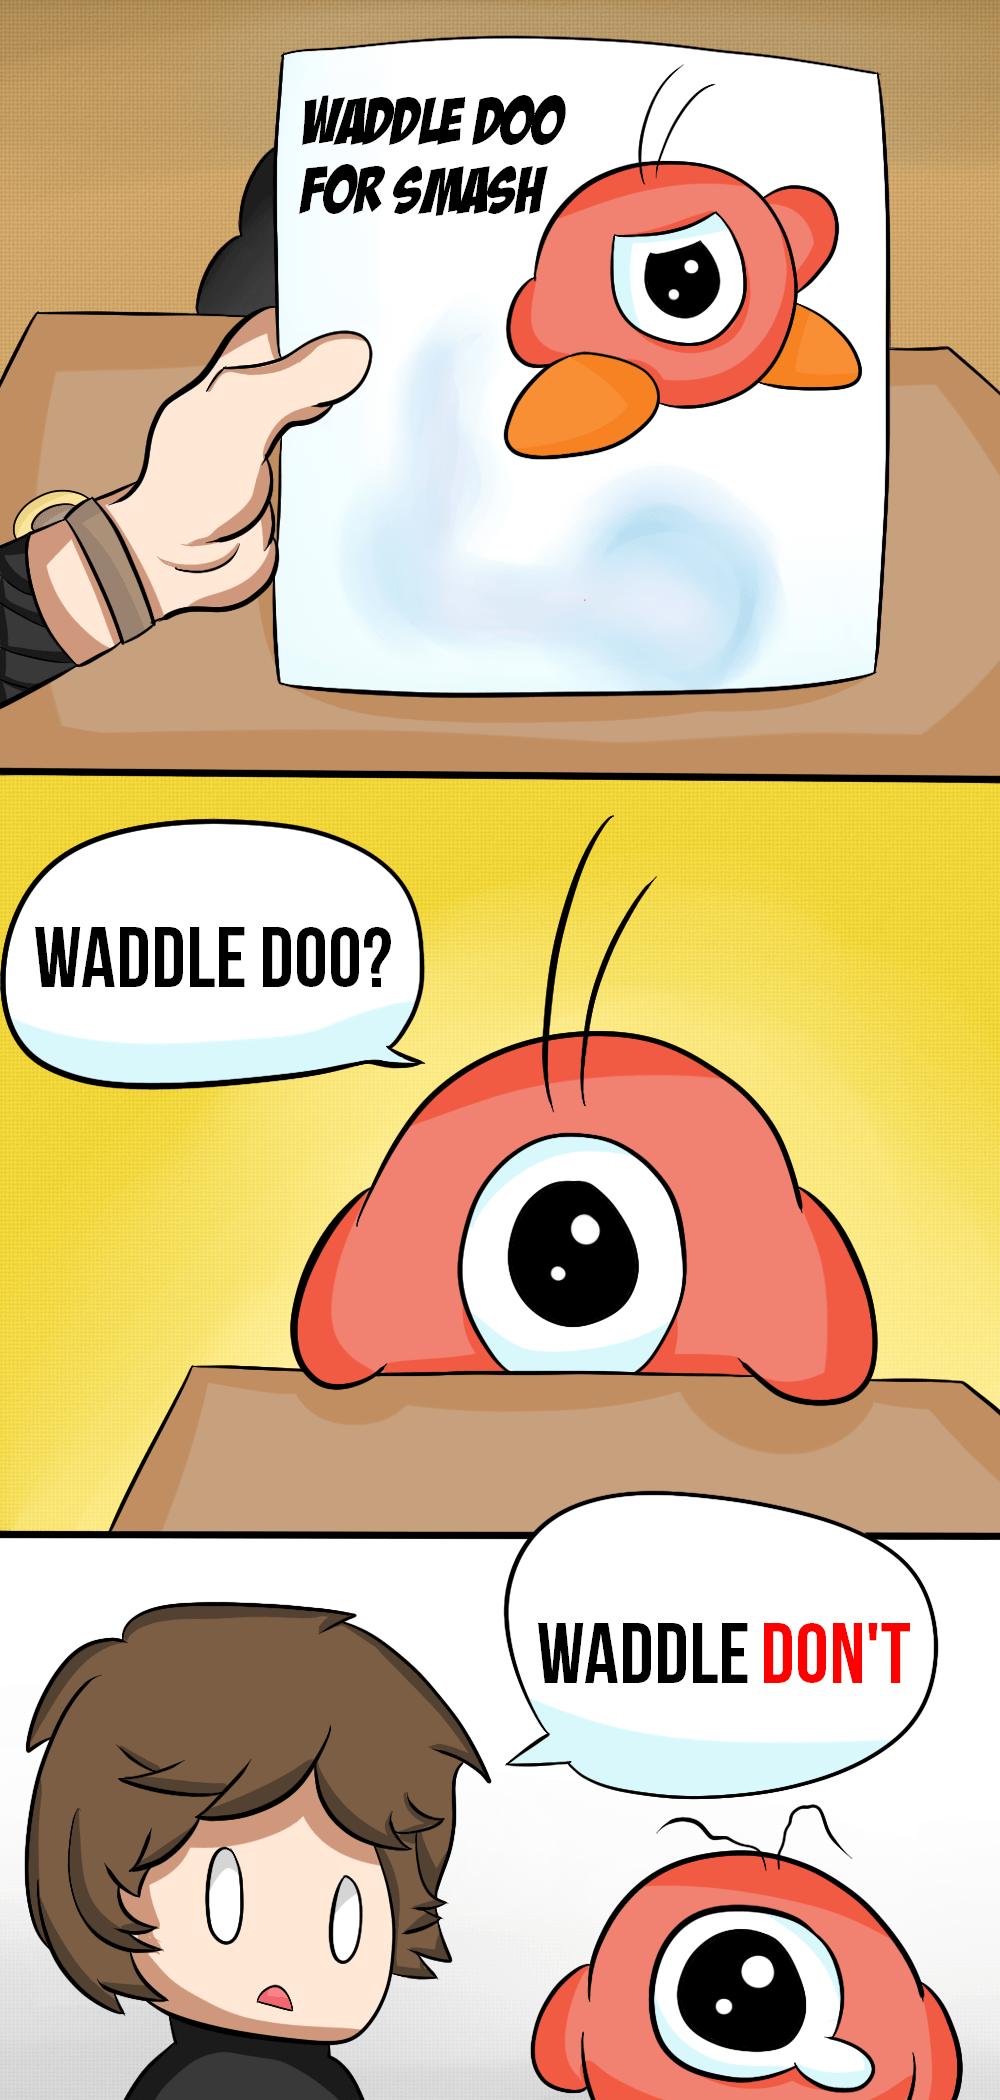 Waddle Doo Smash